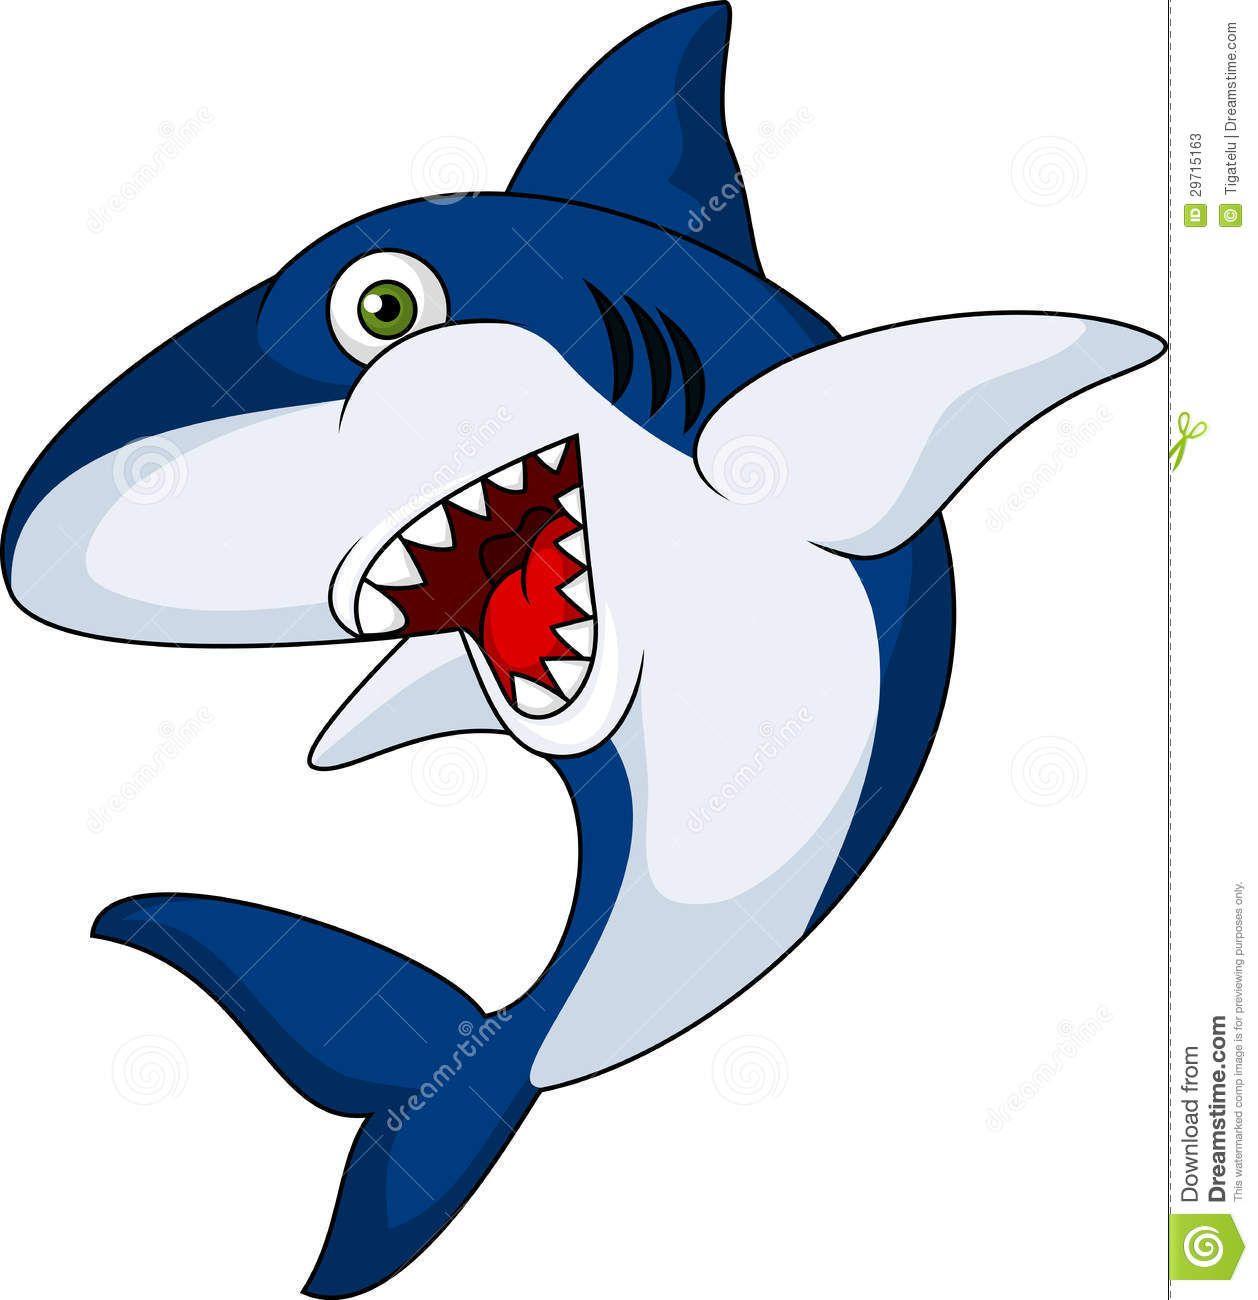 cartoon shark images.